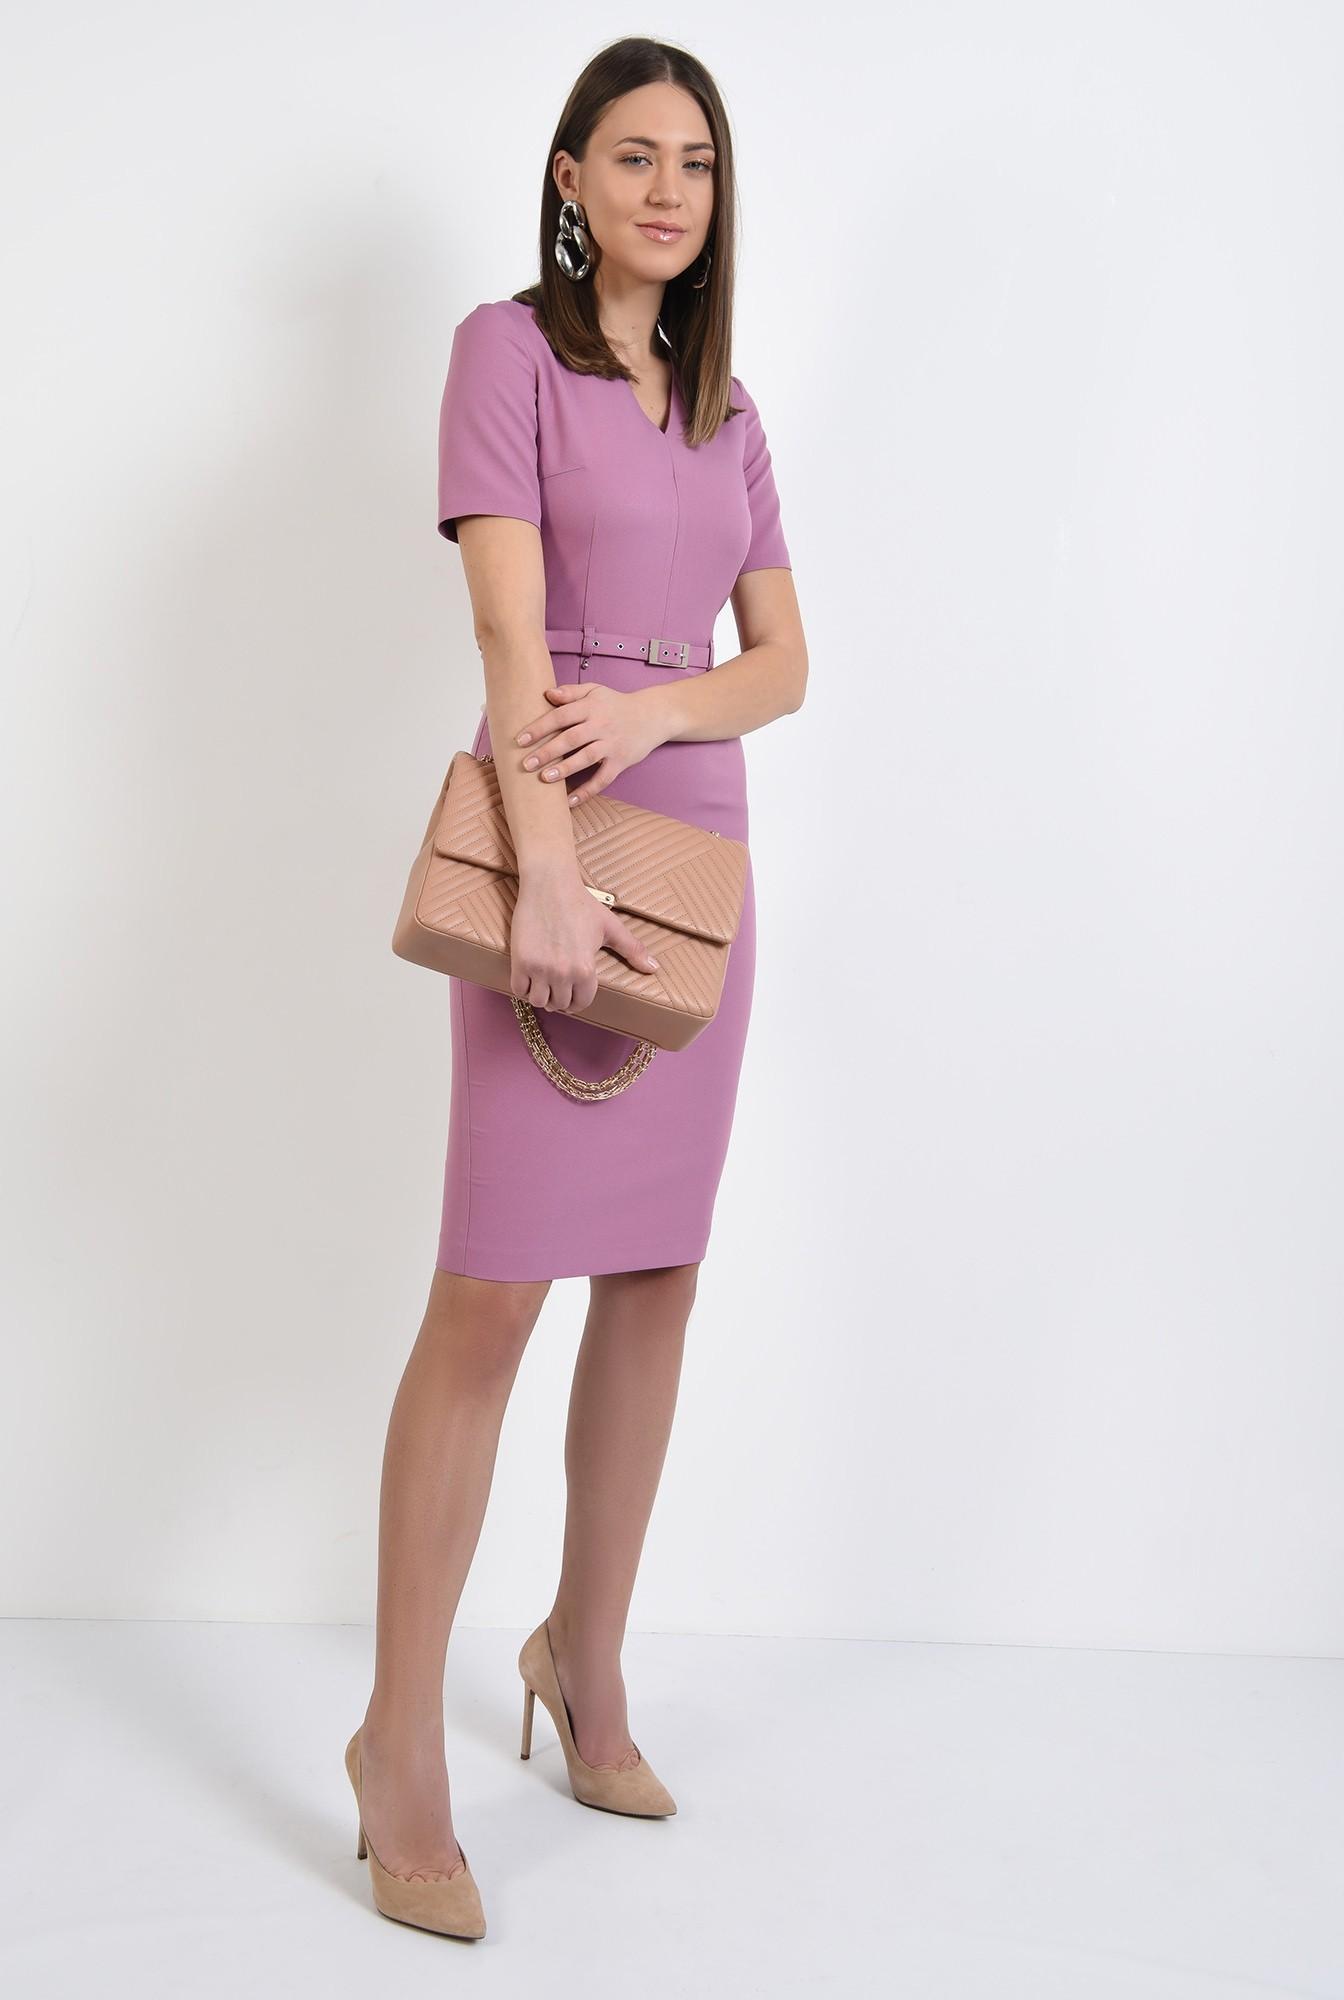 3 - rochie midi, cambrata, cu curea fina, maneci scurte, rochie office, rochie de primavara